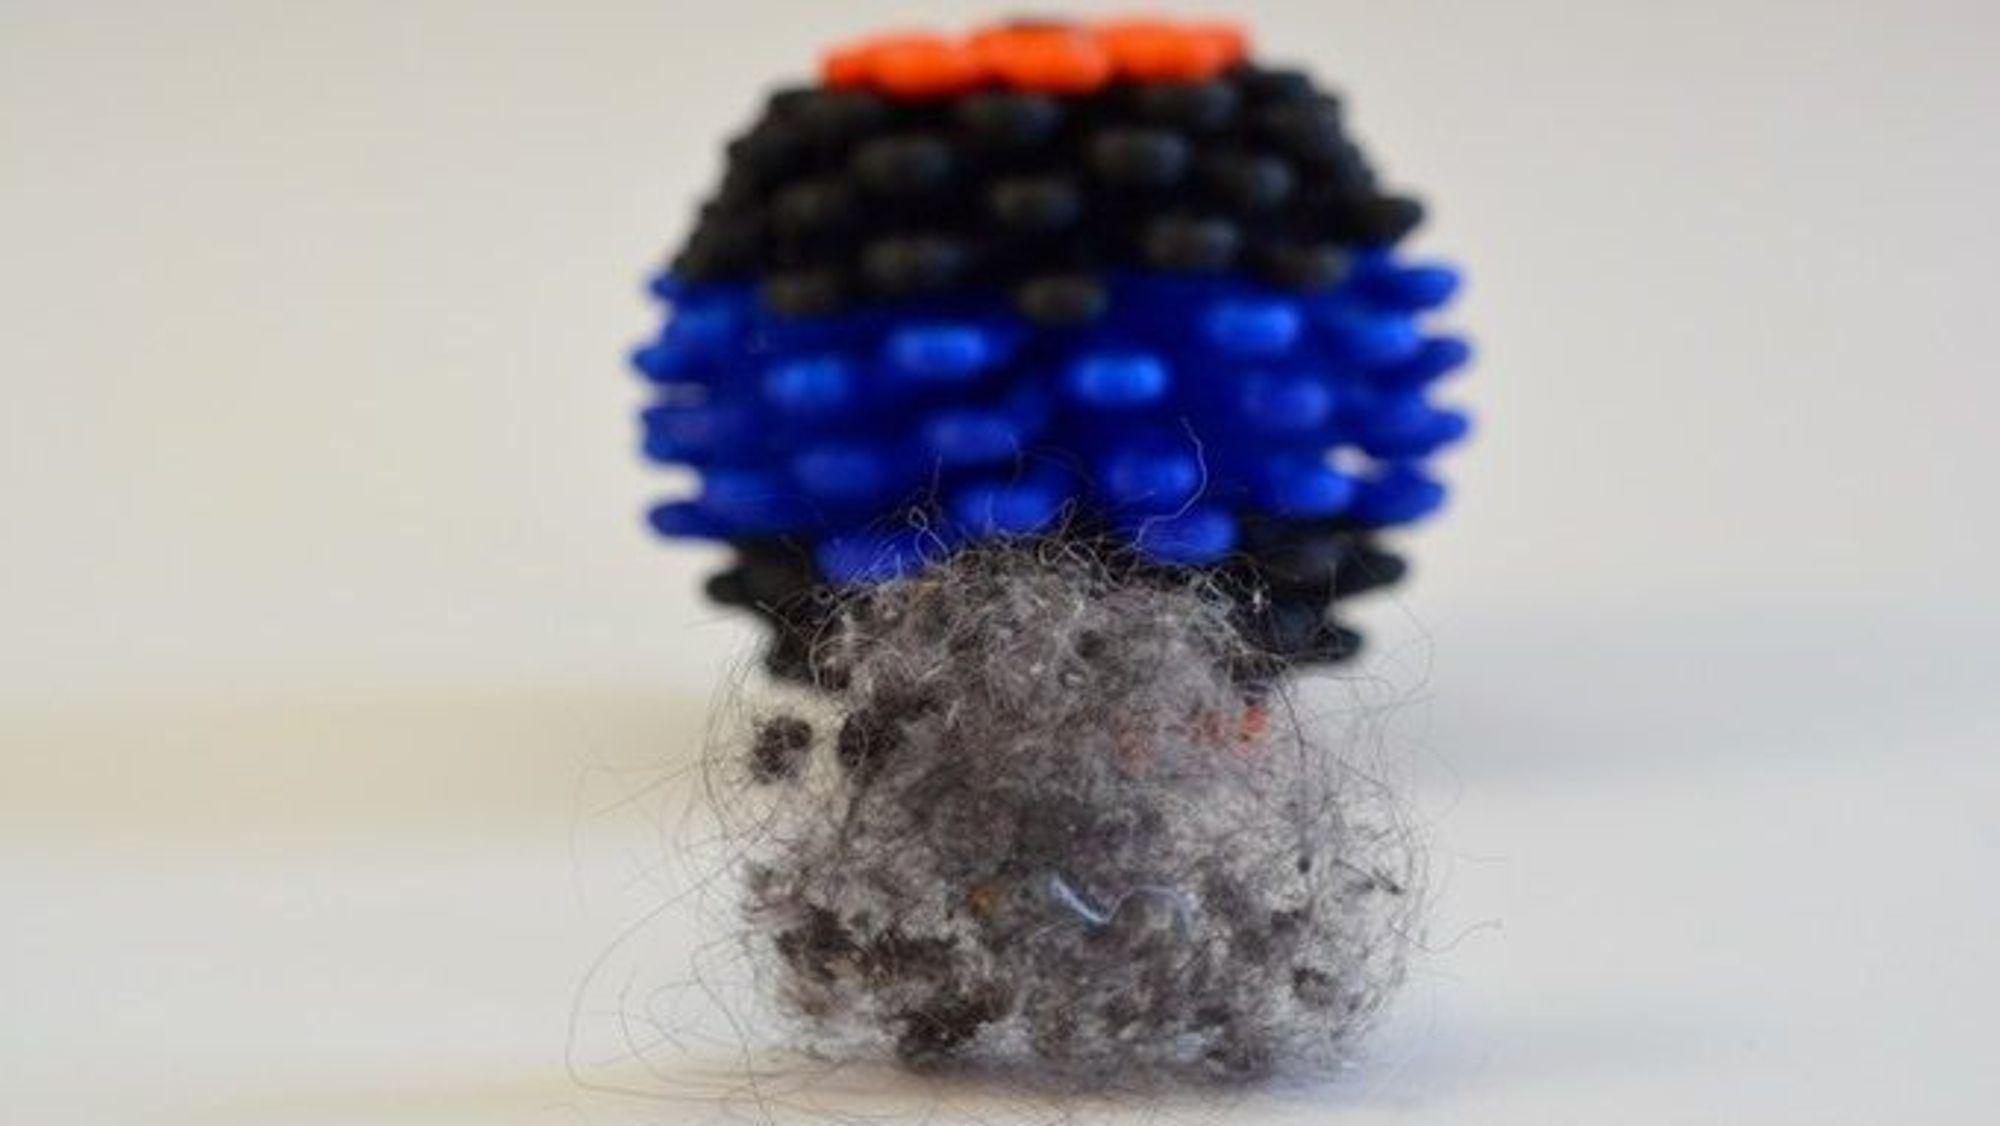 Coraballen skal snurre rundt og fange plastpartikler fra tøyet mens vaskemaskinen går.